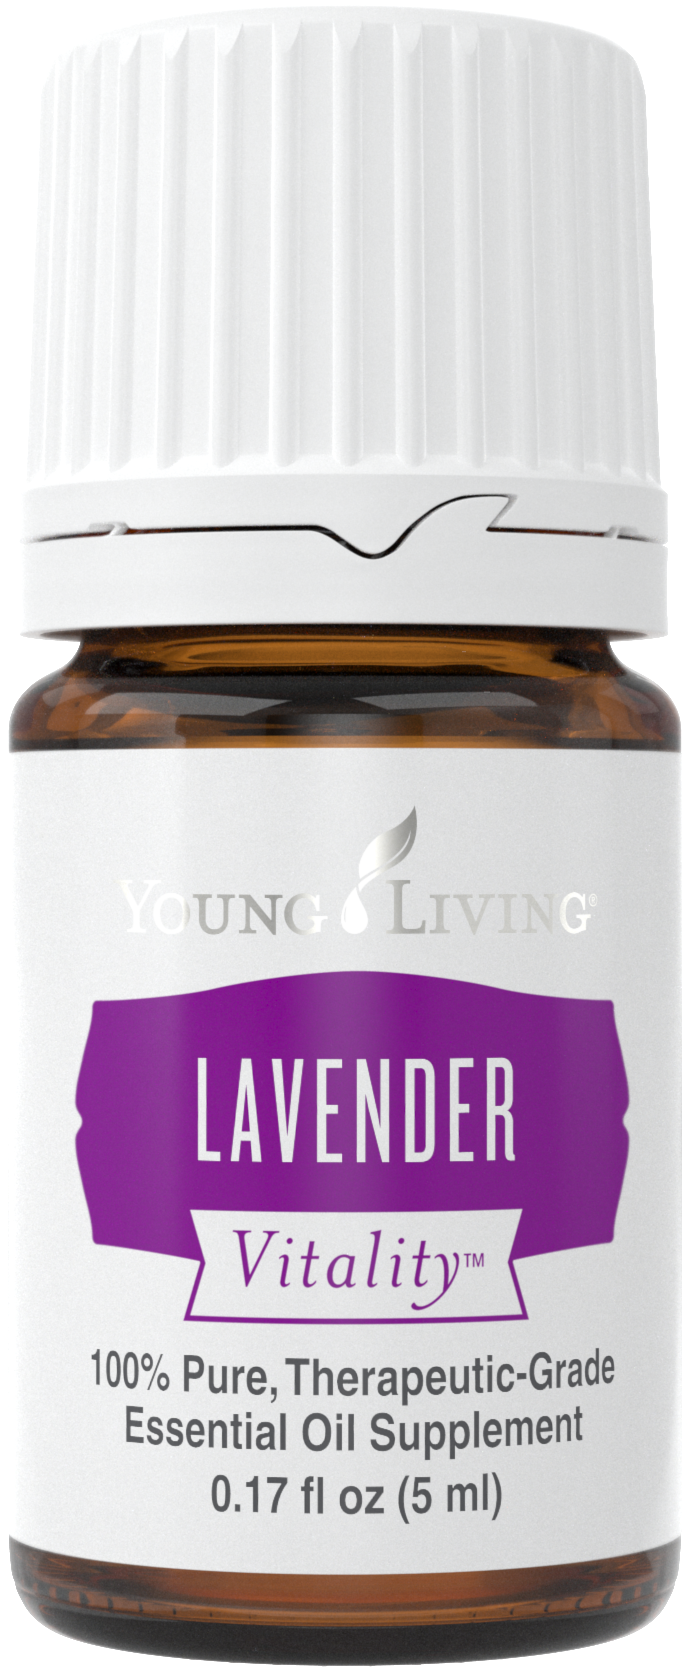 lavender_5ml_suplement_silo_2016_24106825180_o